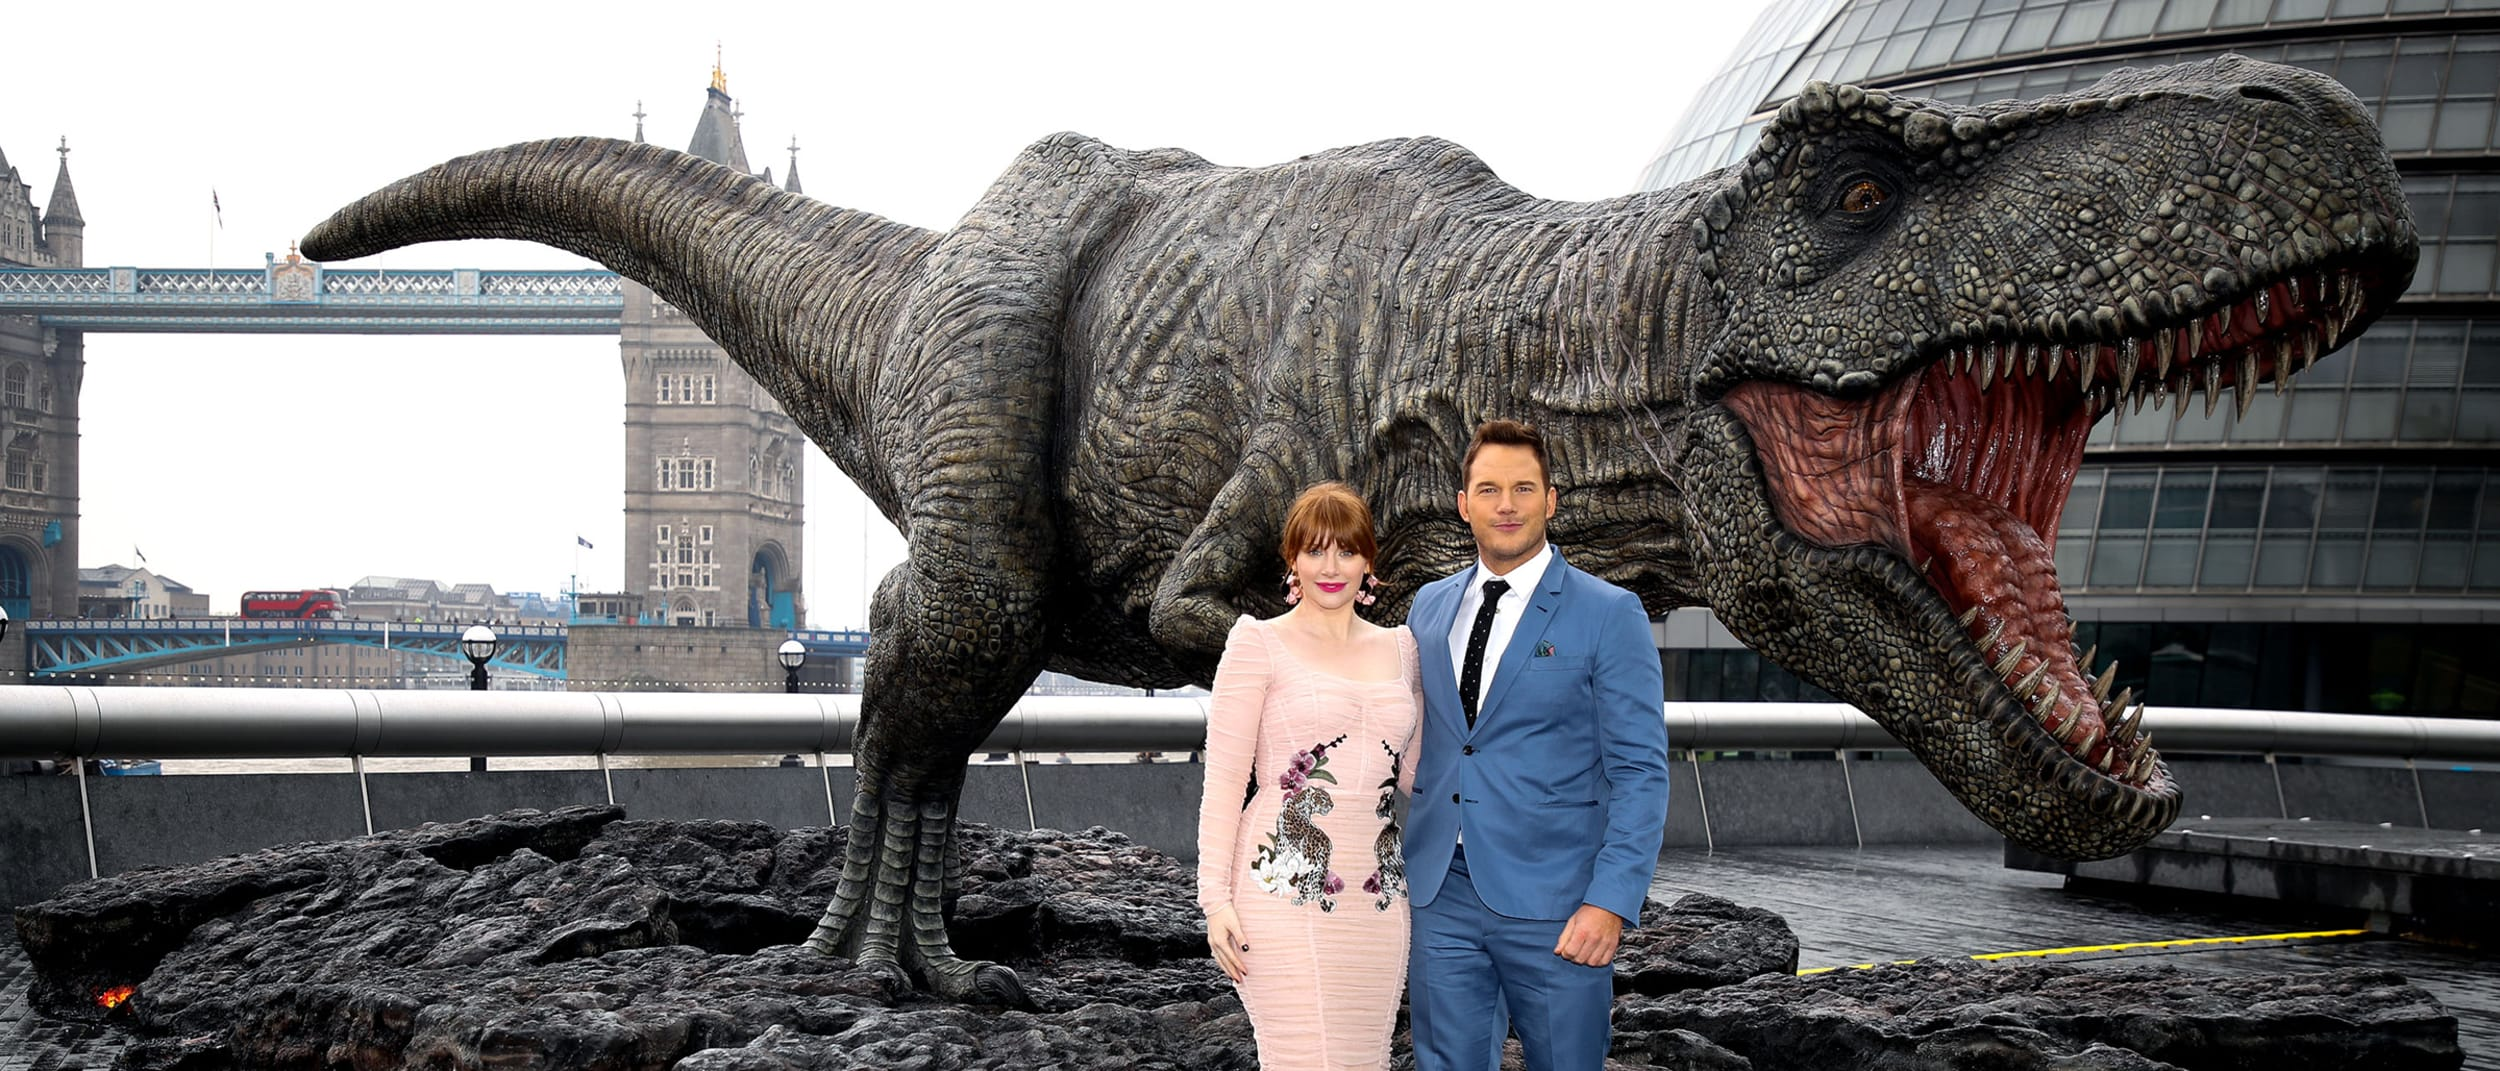 One to watch: Jurassic World: Fallen Kingdom